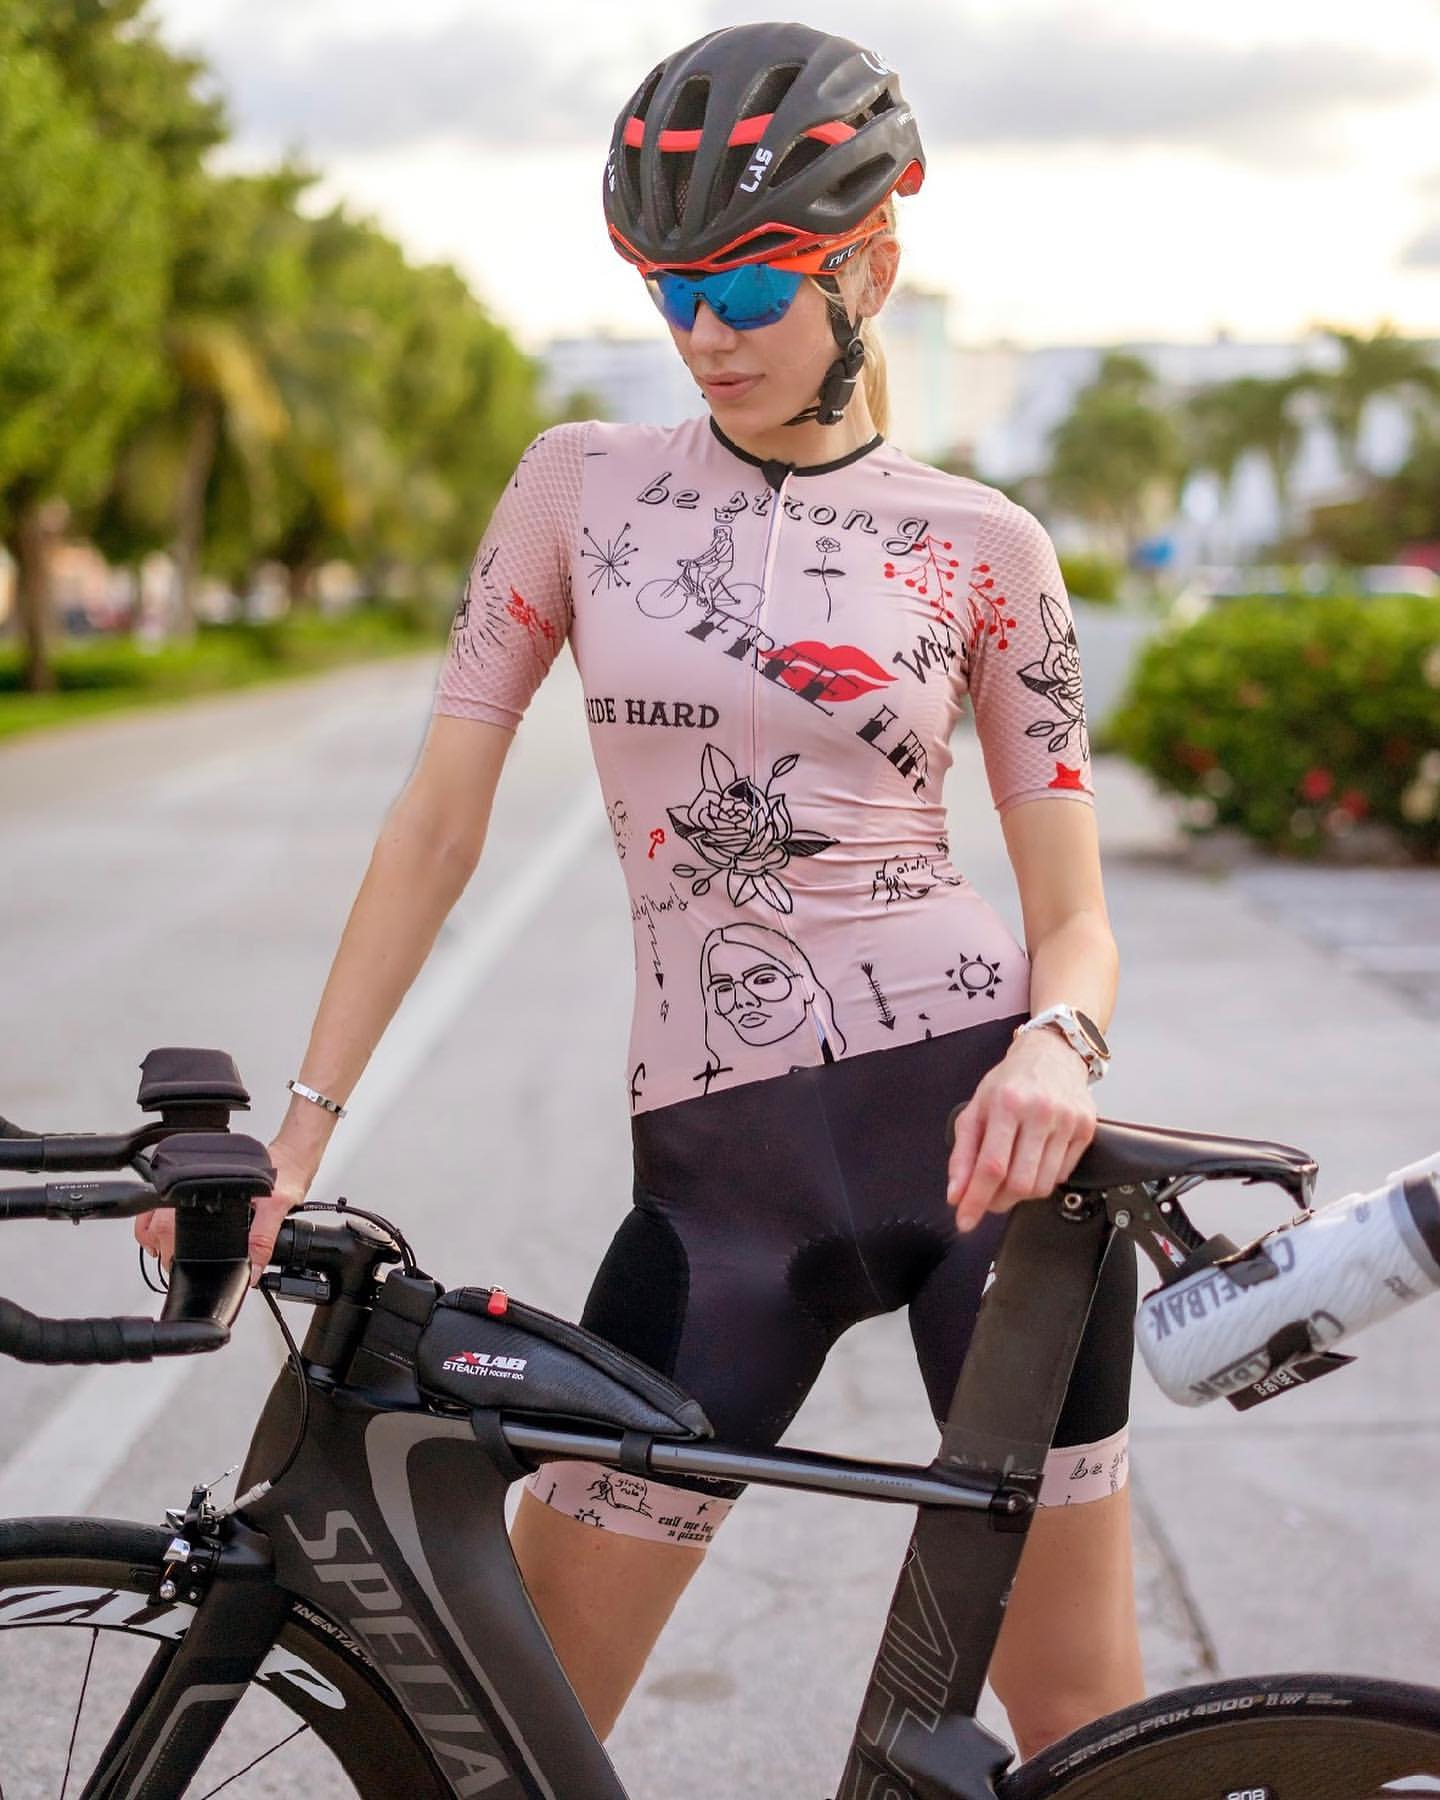 Nadezhda Pavlova standing in Girls Rule pink cycling kit